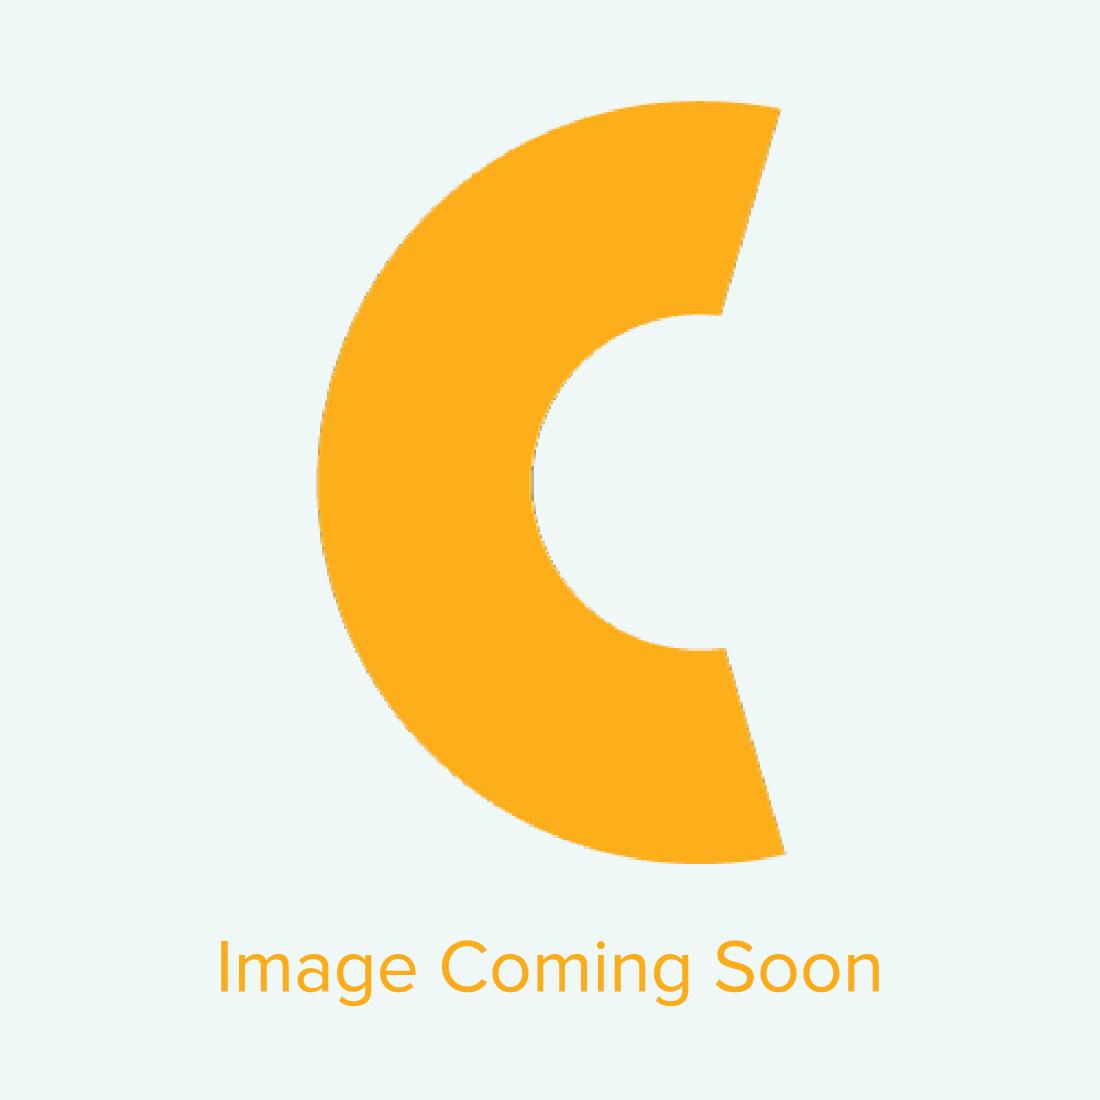 PolySteel Stainless Steel Tumbler – 15oz